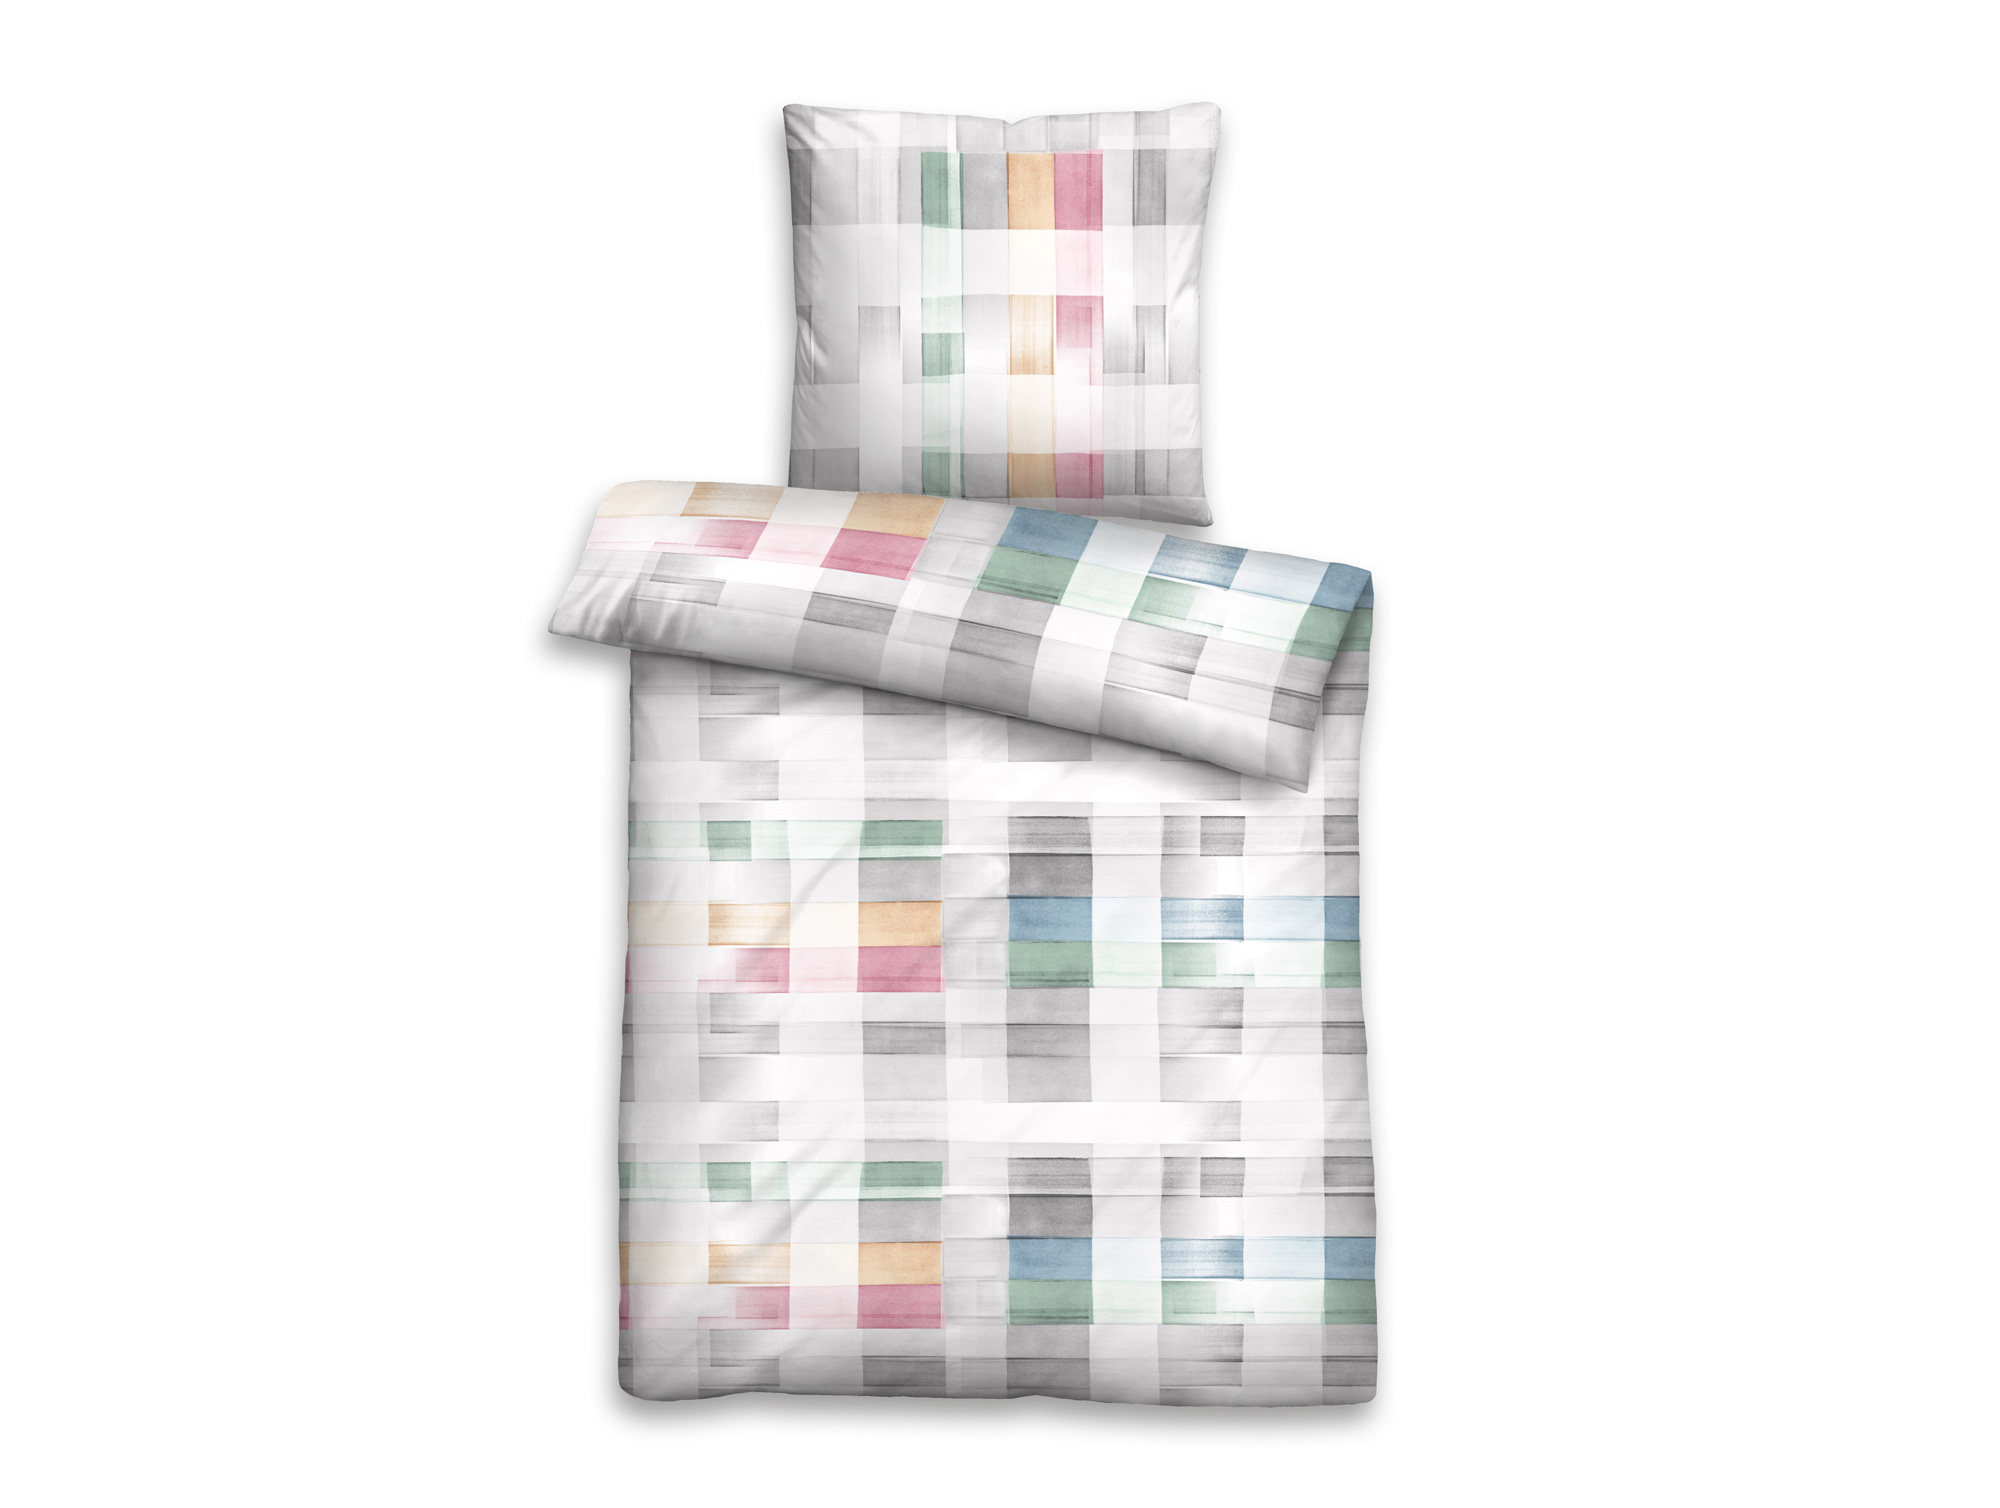 biberna bettw sche mako baumwoll satin 135x200 80x80 cm grau. Black Bedroom Furniture Sets. Home Design Ideas